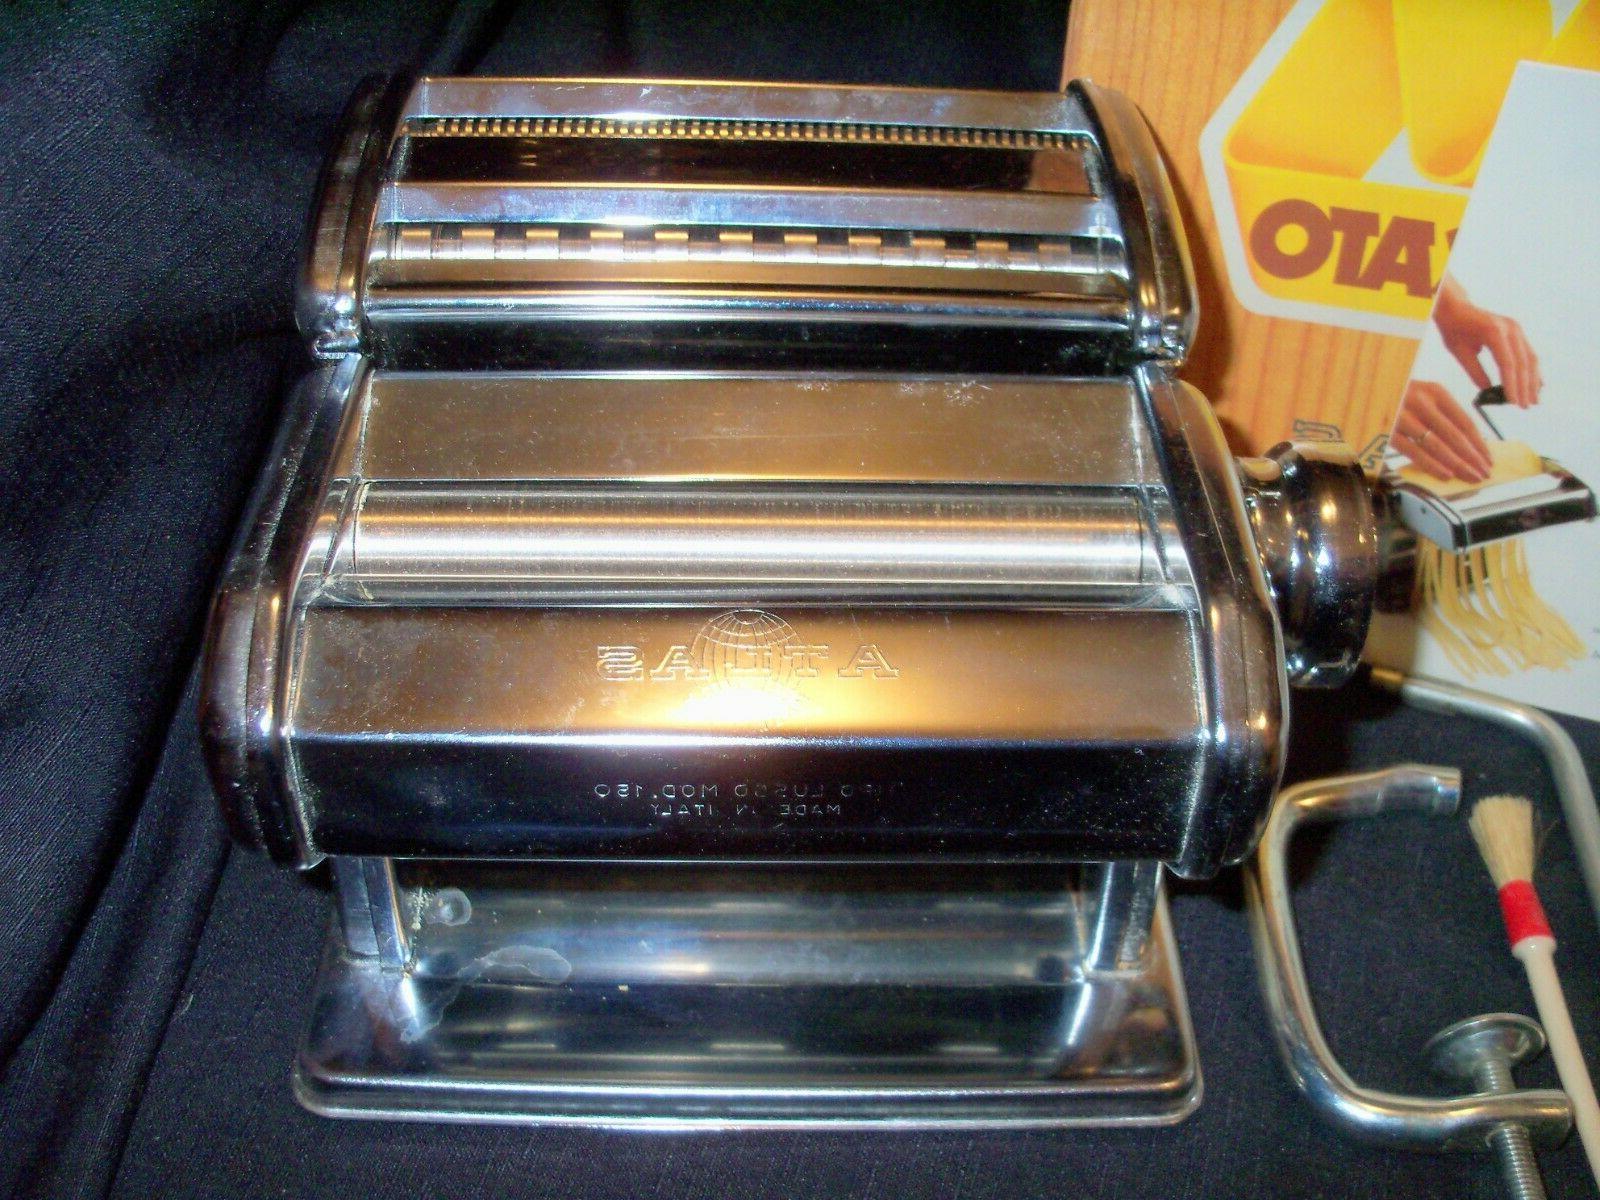 New OMC Marcato 150 Pastabike w/box #2